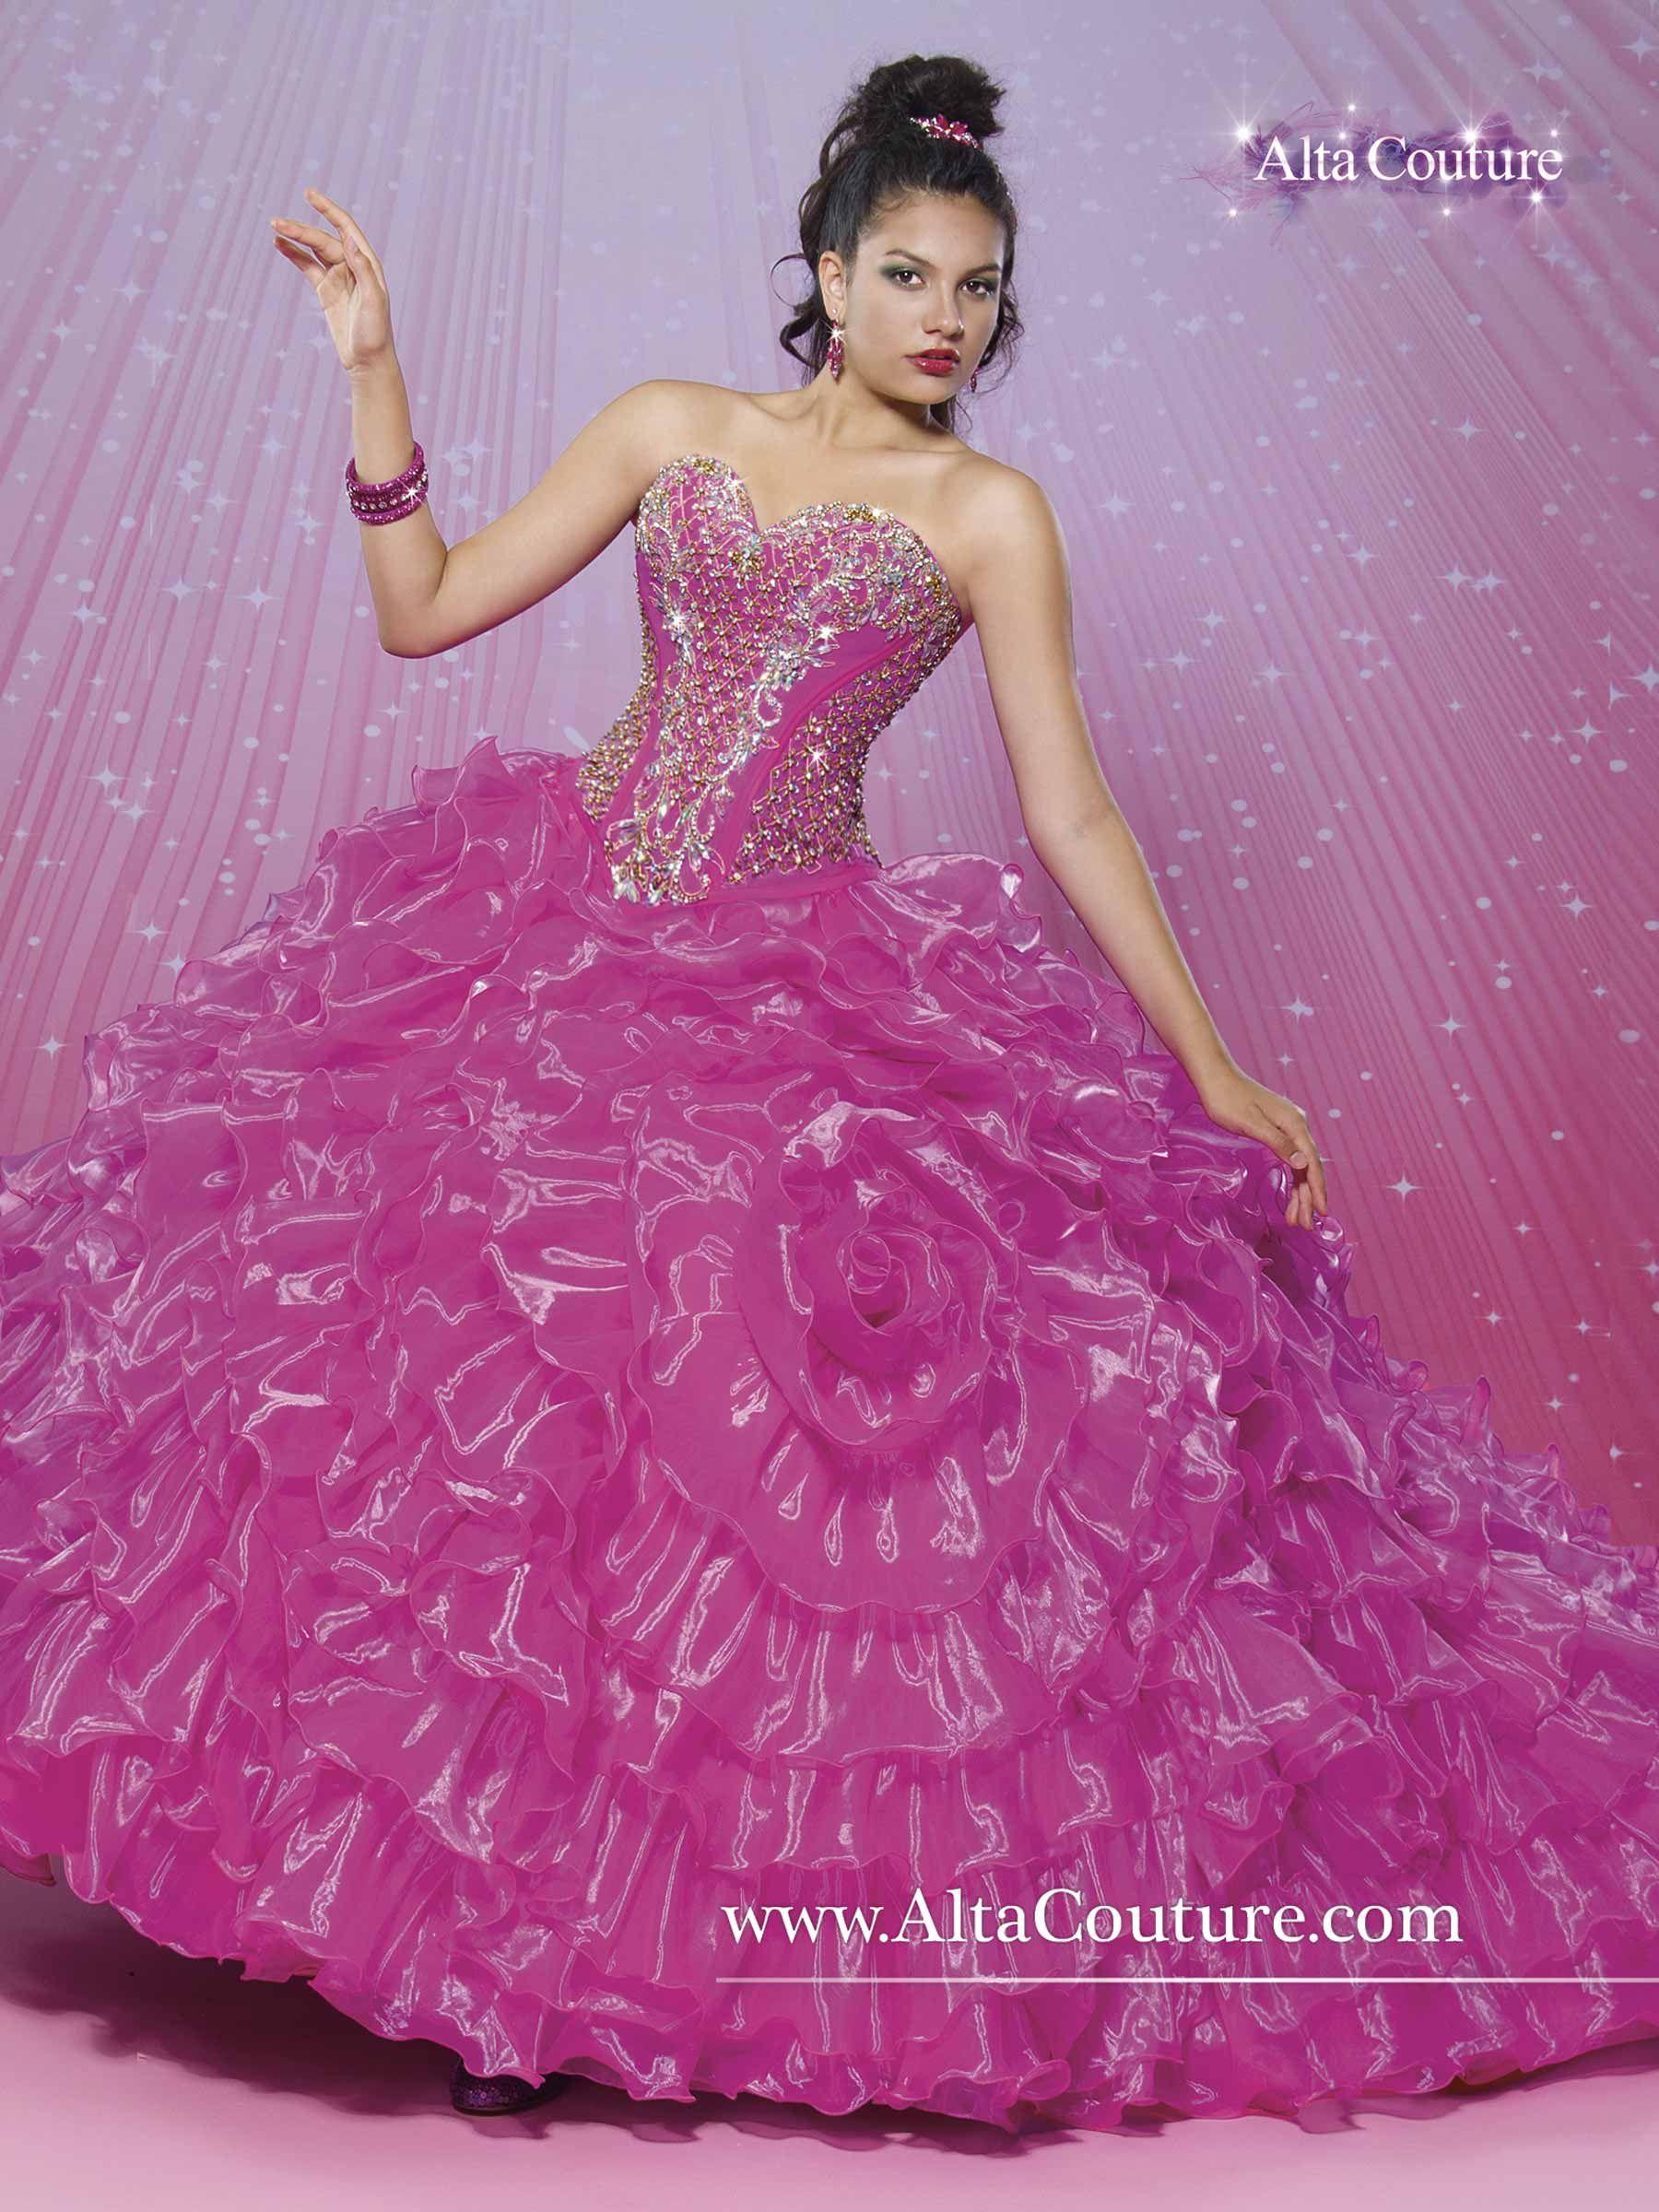 QUINCEANERA   ༺♥༻Quinceanera Princess༺♥༻   Pinterest ...